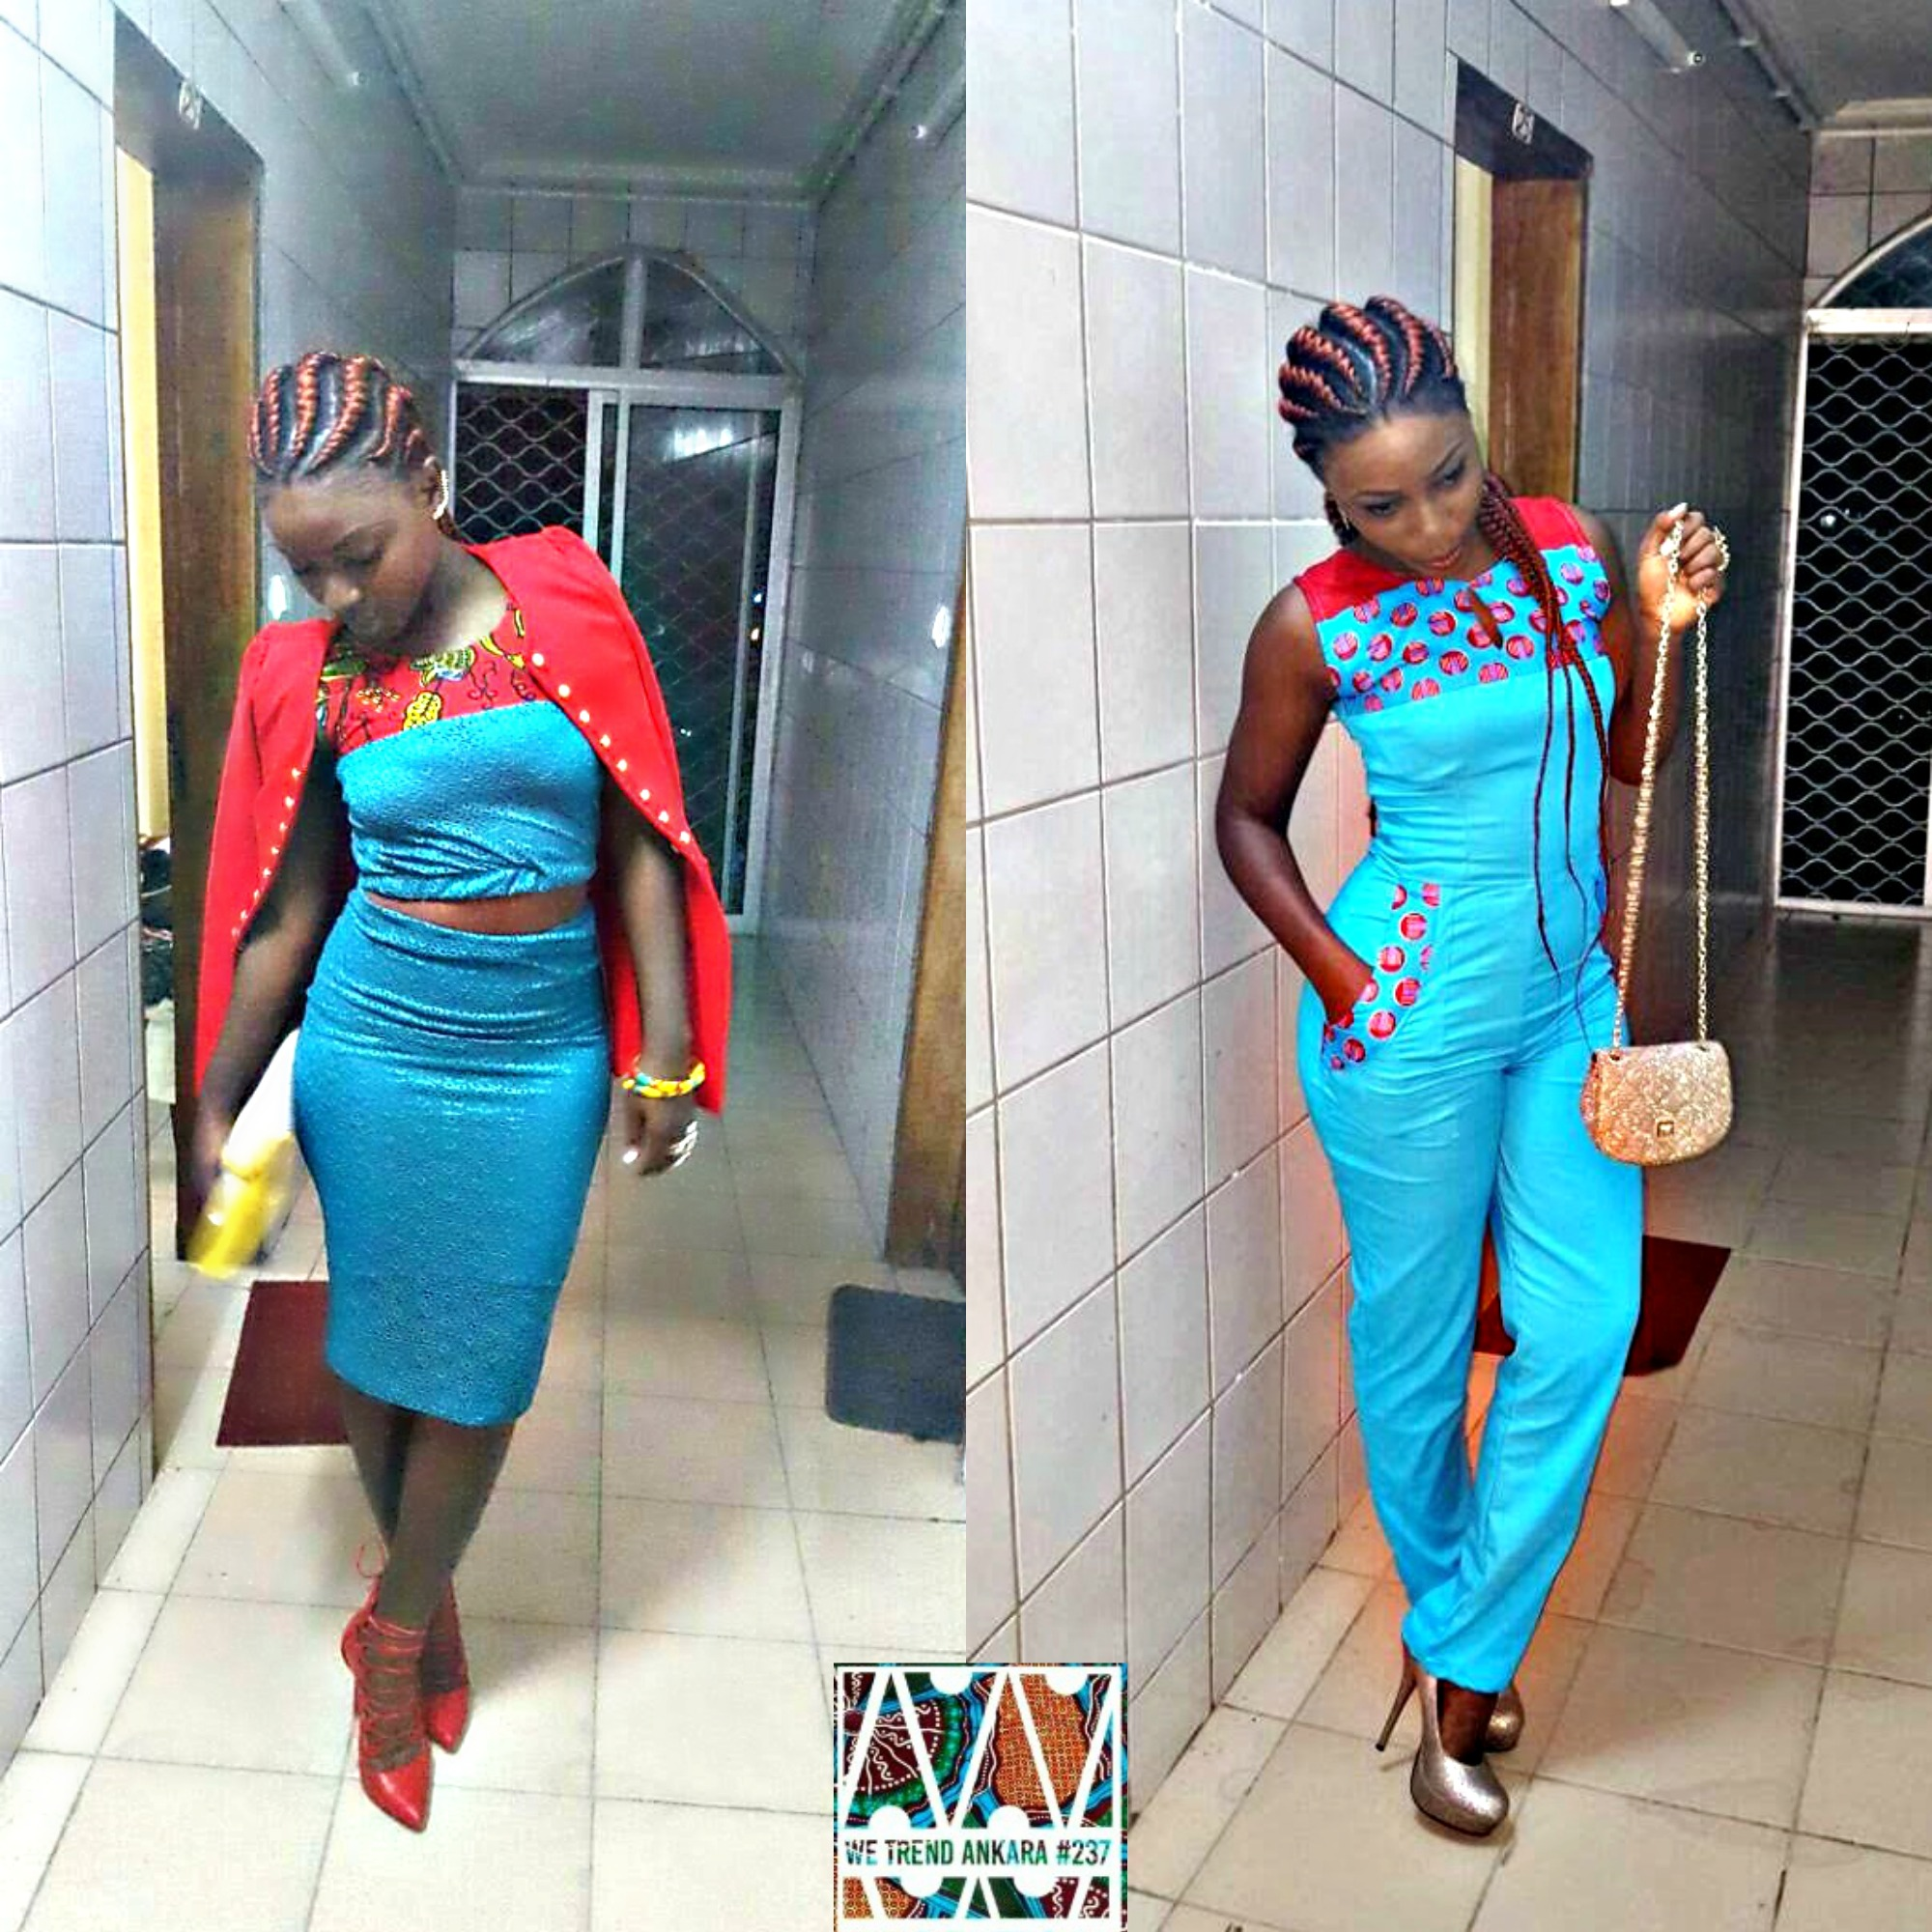 Buea Fashion Week WTA237 collage